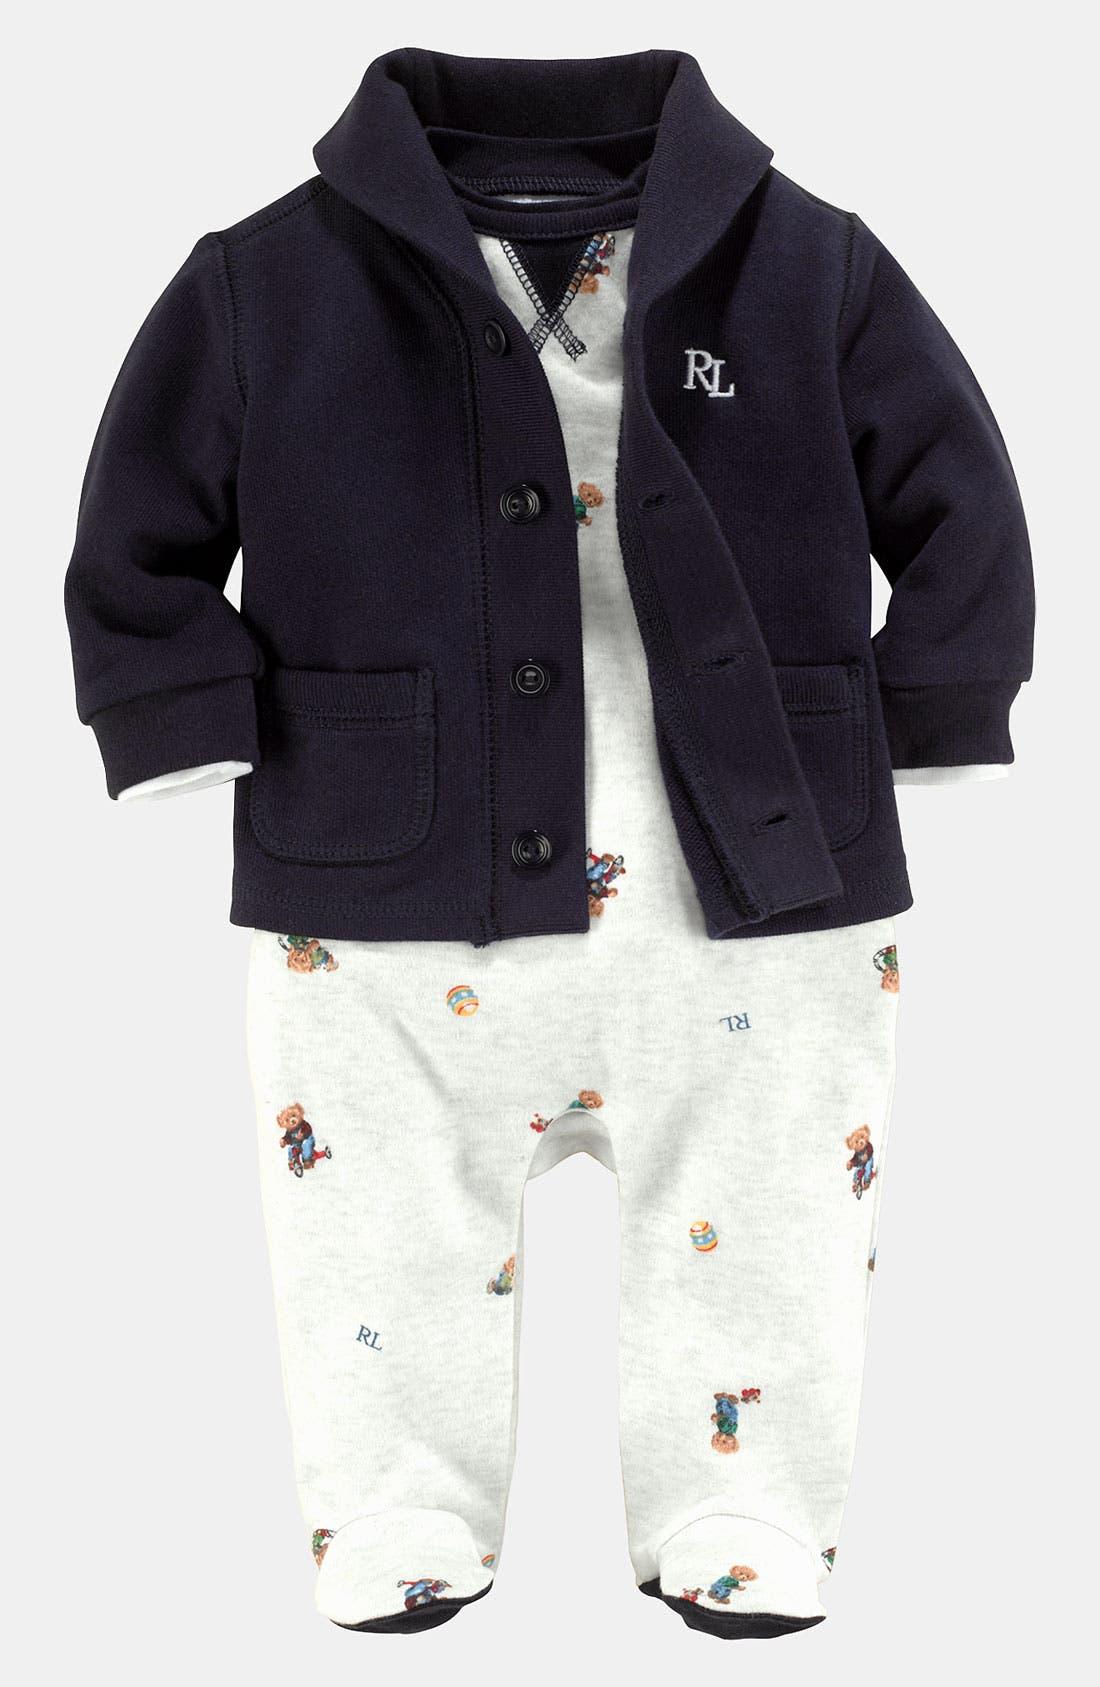 Alternate Image 1 Selected - Ralph Lauren Bodysuit, Overalls & Cardigan (Infant)